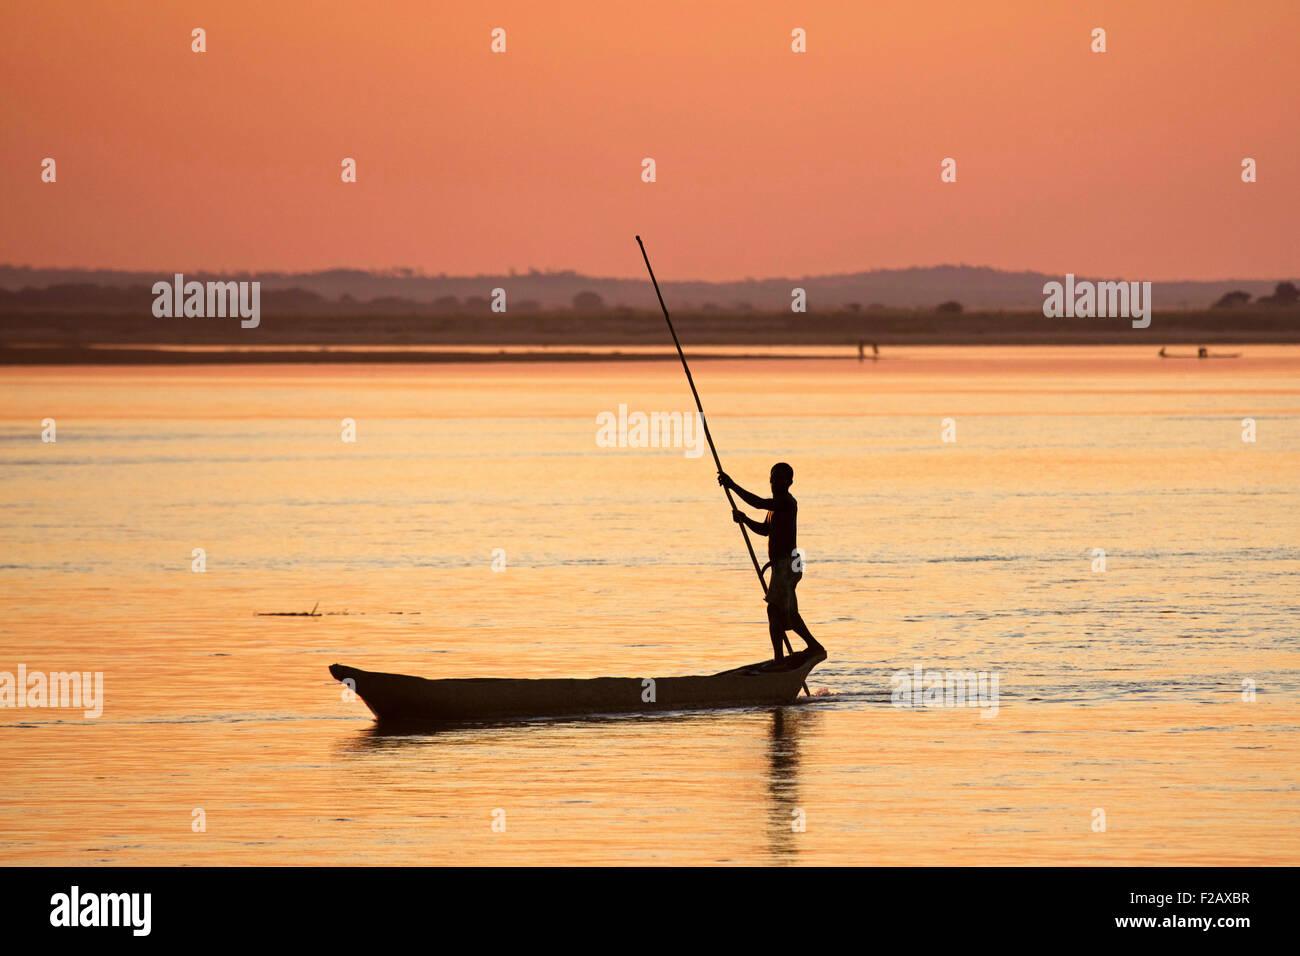 Silhouette of Malagasy fisherman punting pirogue with push pole on Tsiribihina / Tsiribinha river at sunset, Menabe, - Stock Image